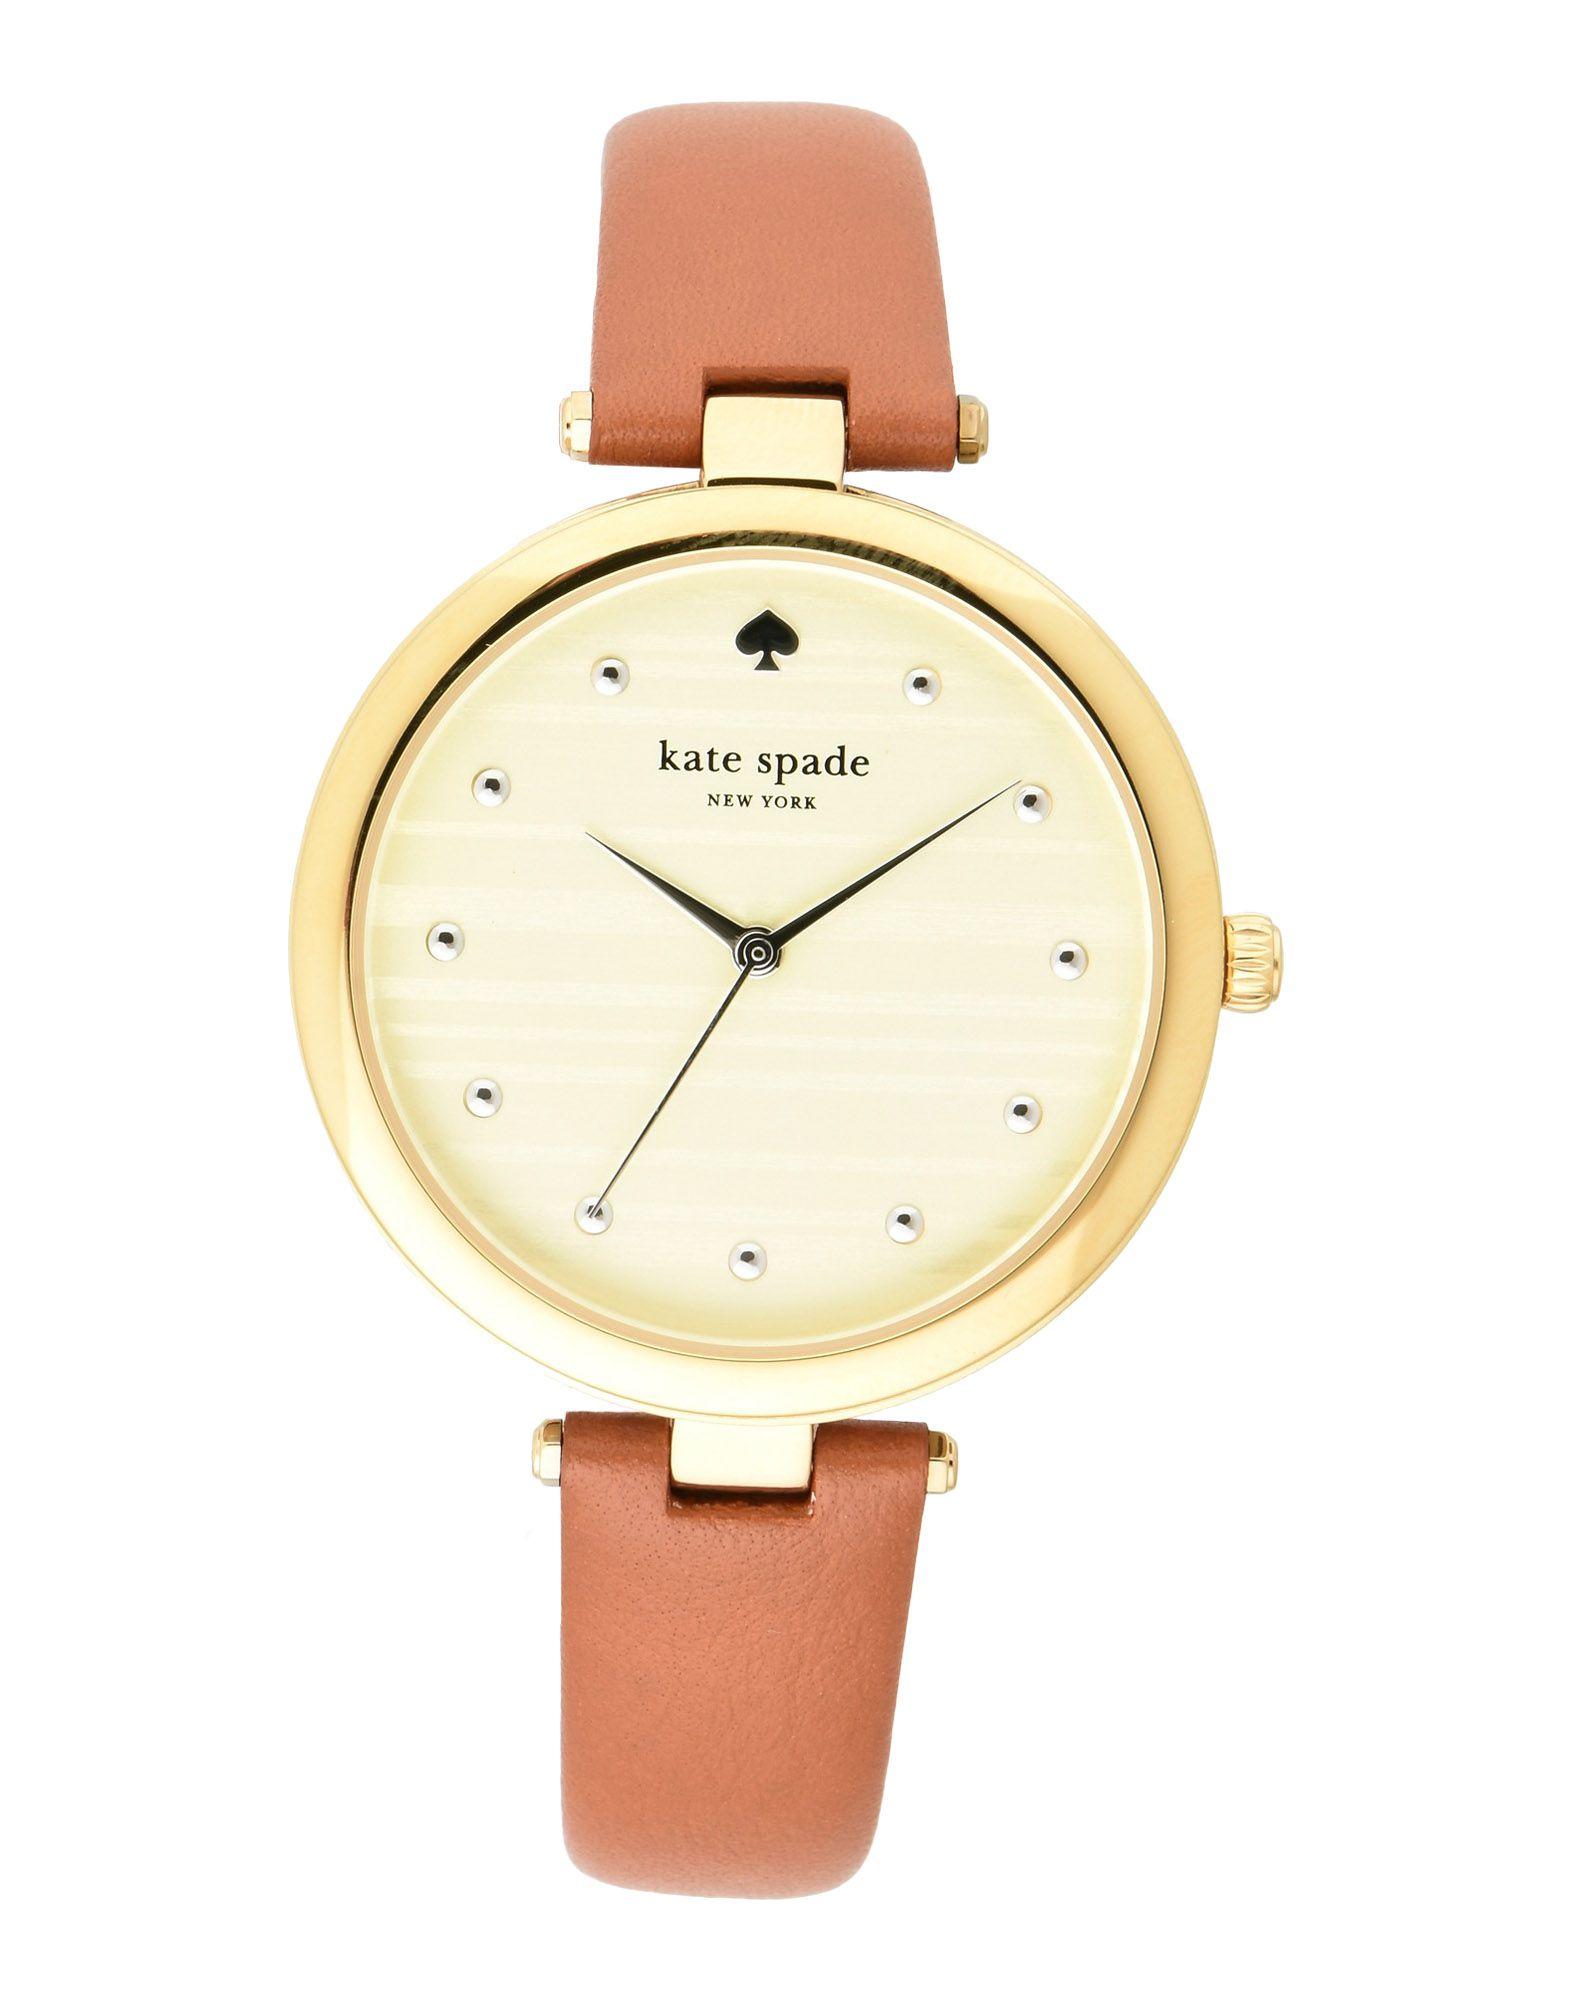 KATE SPADE New York Наручные часы inverter 8000 series vr75m3 0 75kw 380v new